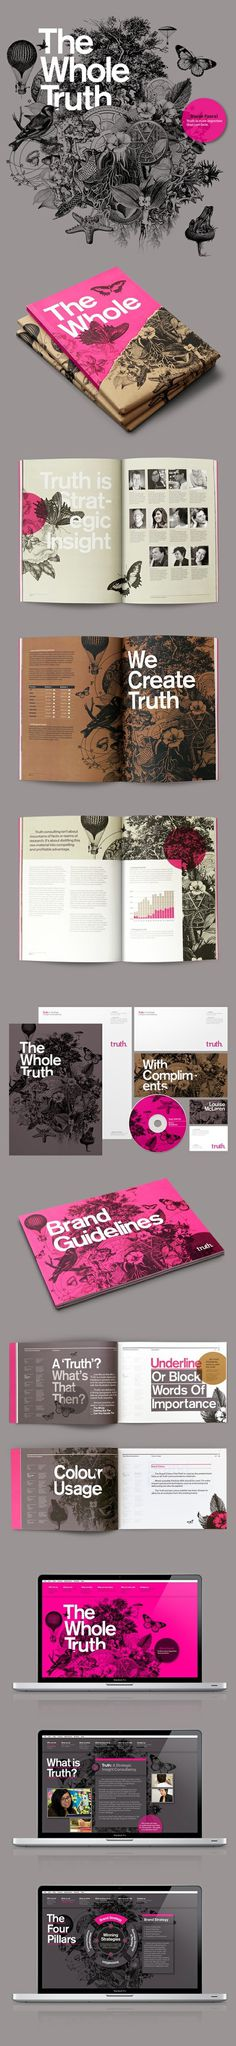 Truth Branding by Socio Design #logo graphic design